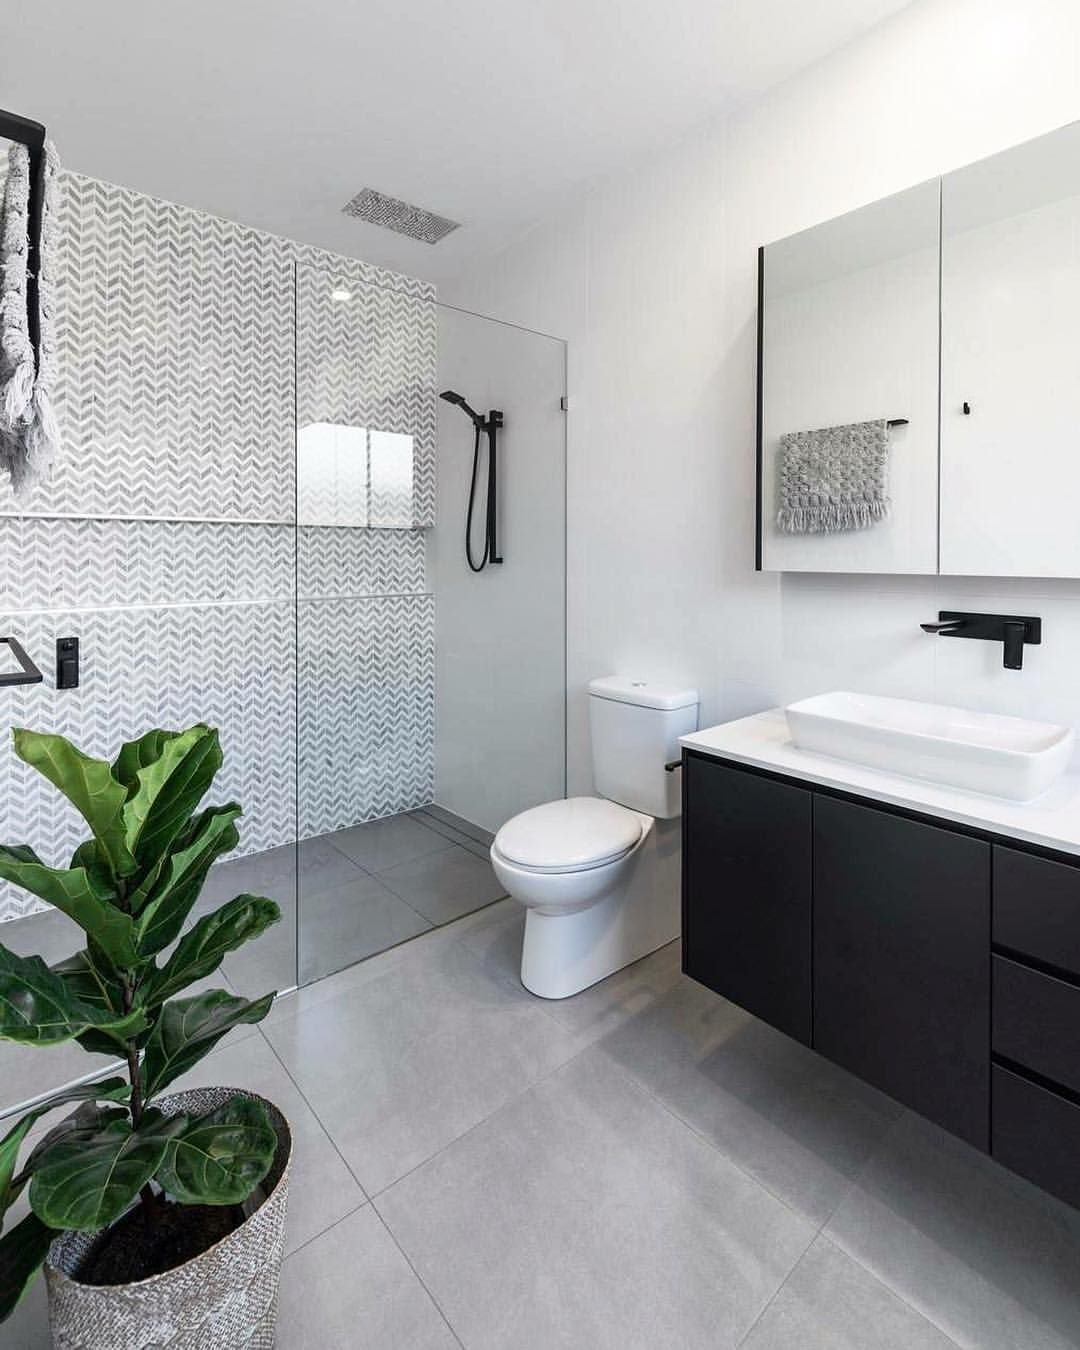 Fresh Project Spencer Proving That Less Is Always More Ensuite Bathroom Camphill Diseno De Banos Pisos Para Banos Decoracion De Banos Modernos